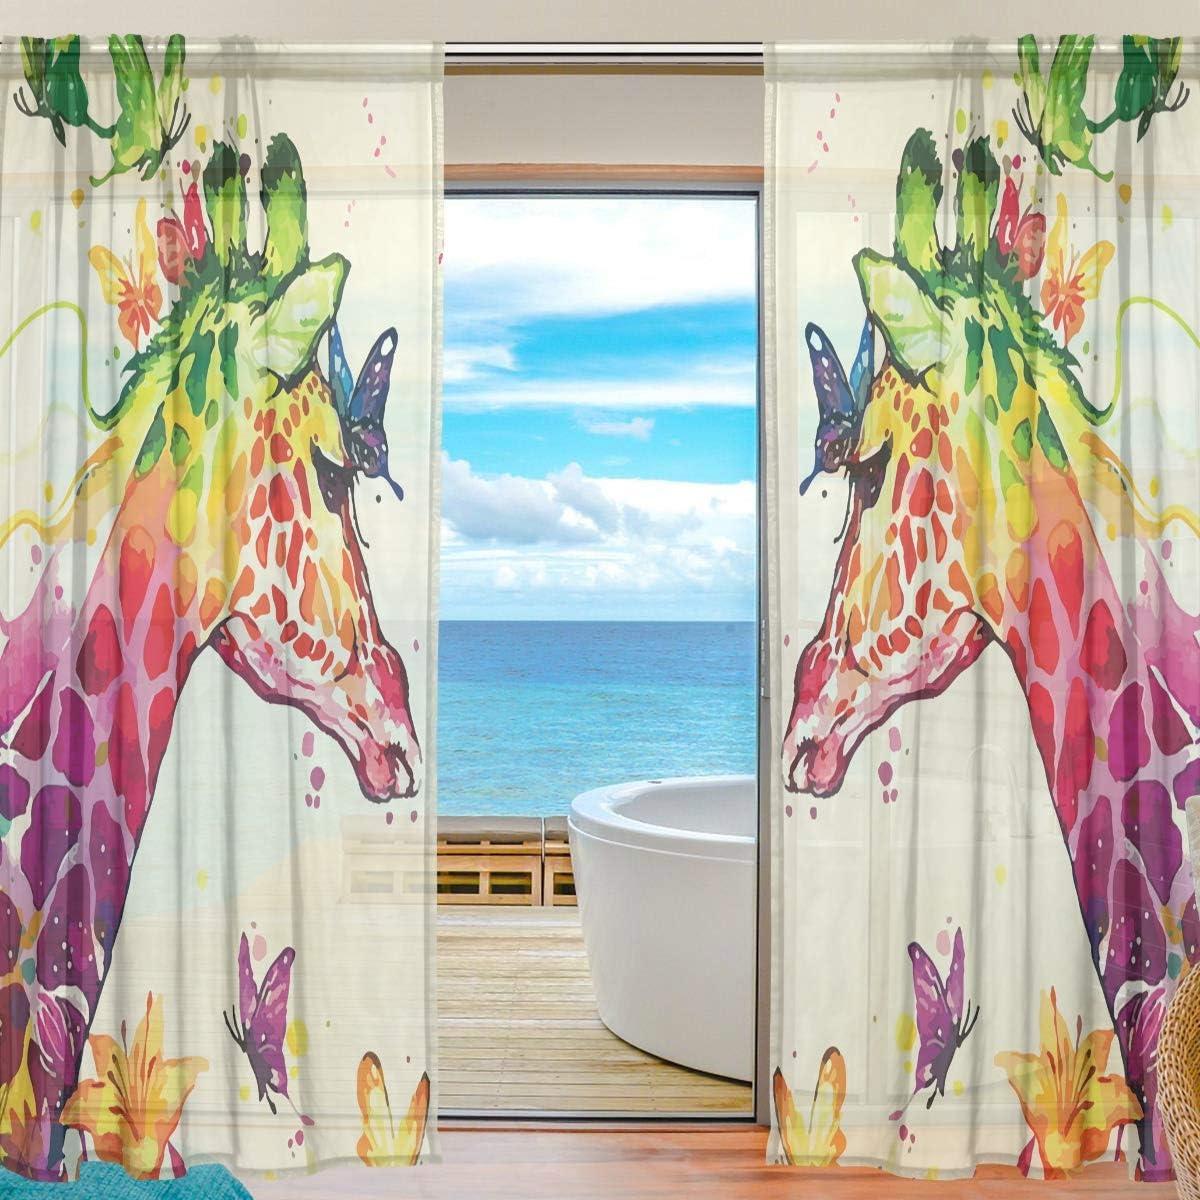 Mr.Brilliant おすすめ Giraffe Butterfly Sheer for Waterc Bedroom Curtains 激安挑戦中